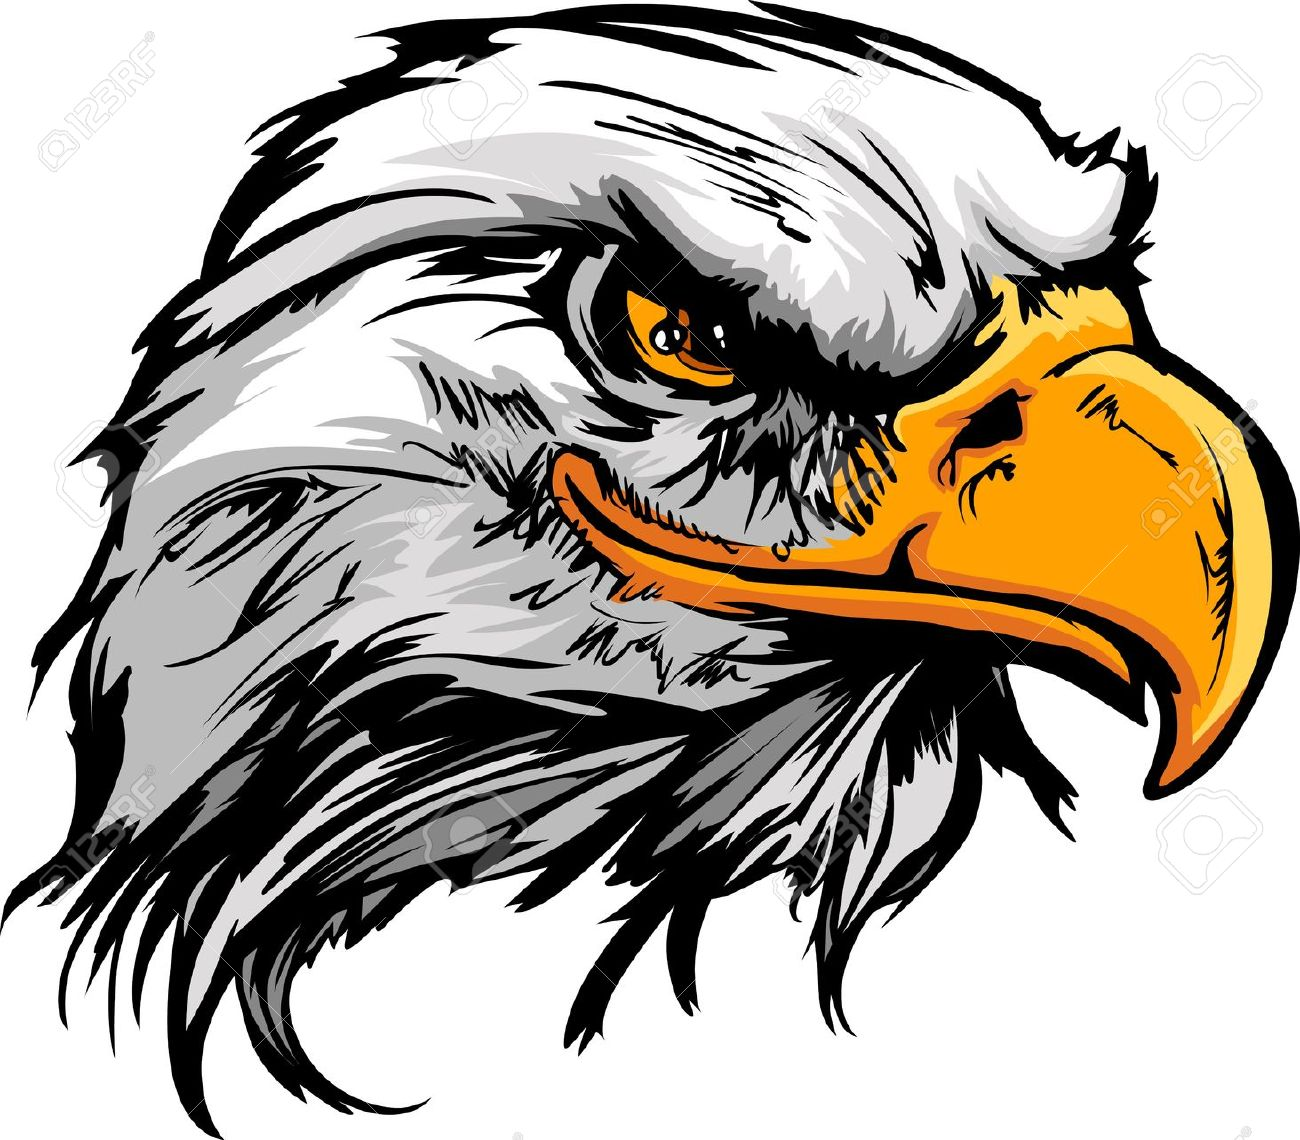 Hawk clipart #6, Download drawings